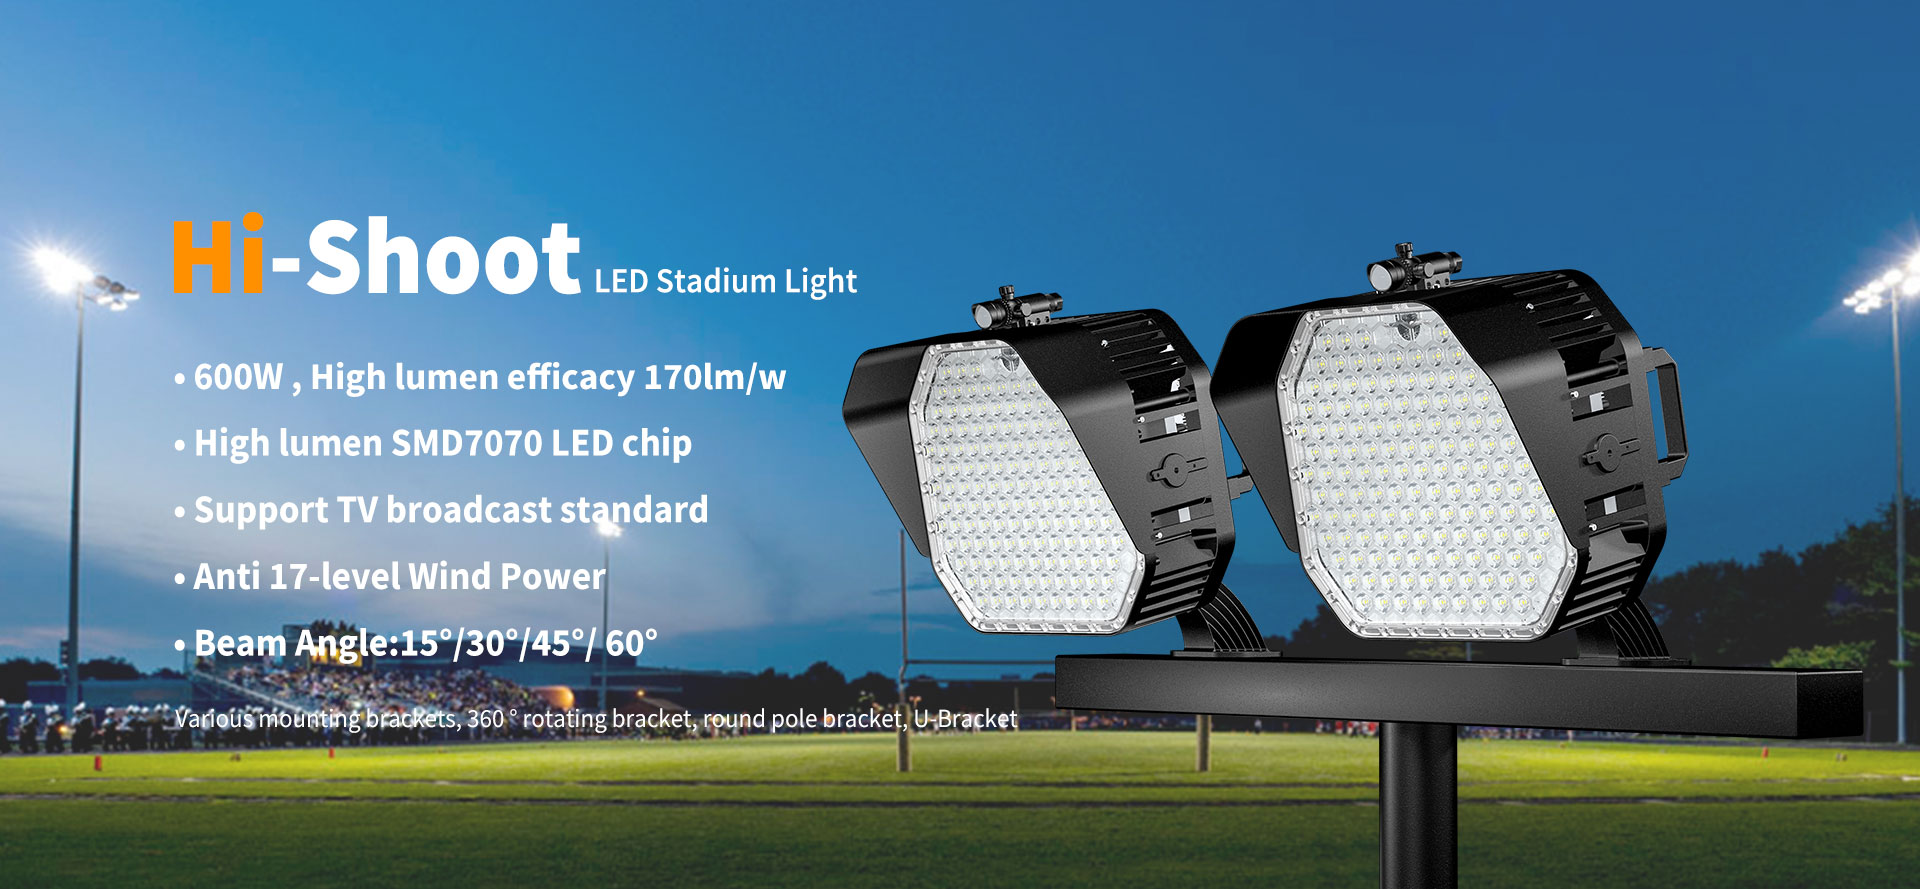 600W Hi-Shoot led stadium light